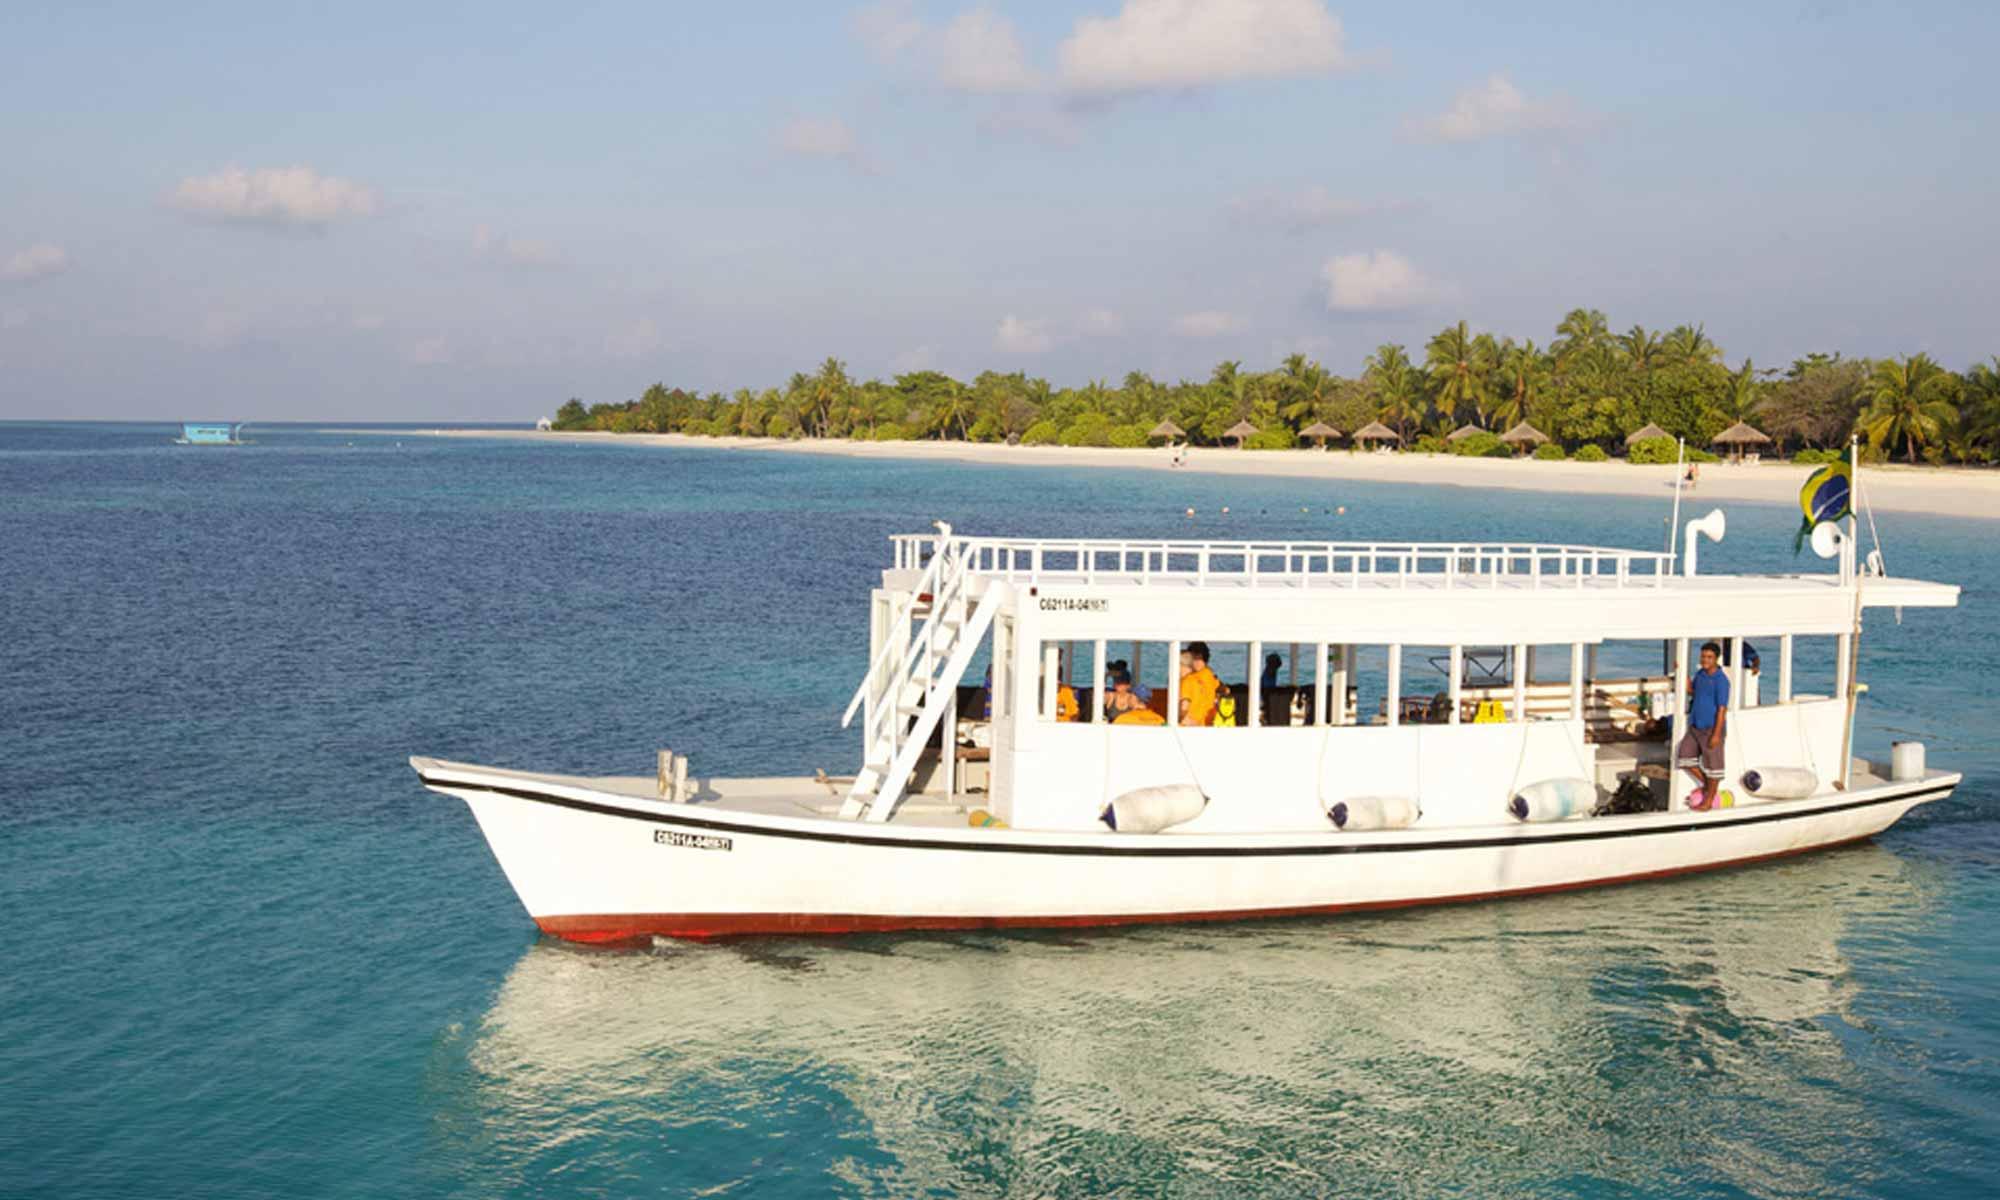 Slow Dive Indischer Ozean Malediven Pro Divers Kuredu Bootsausfahrt